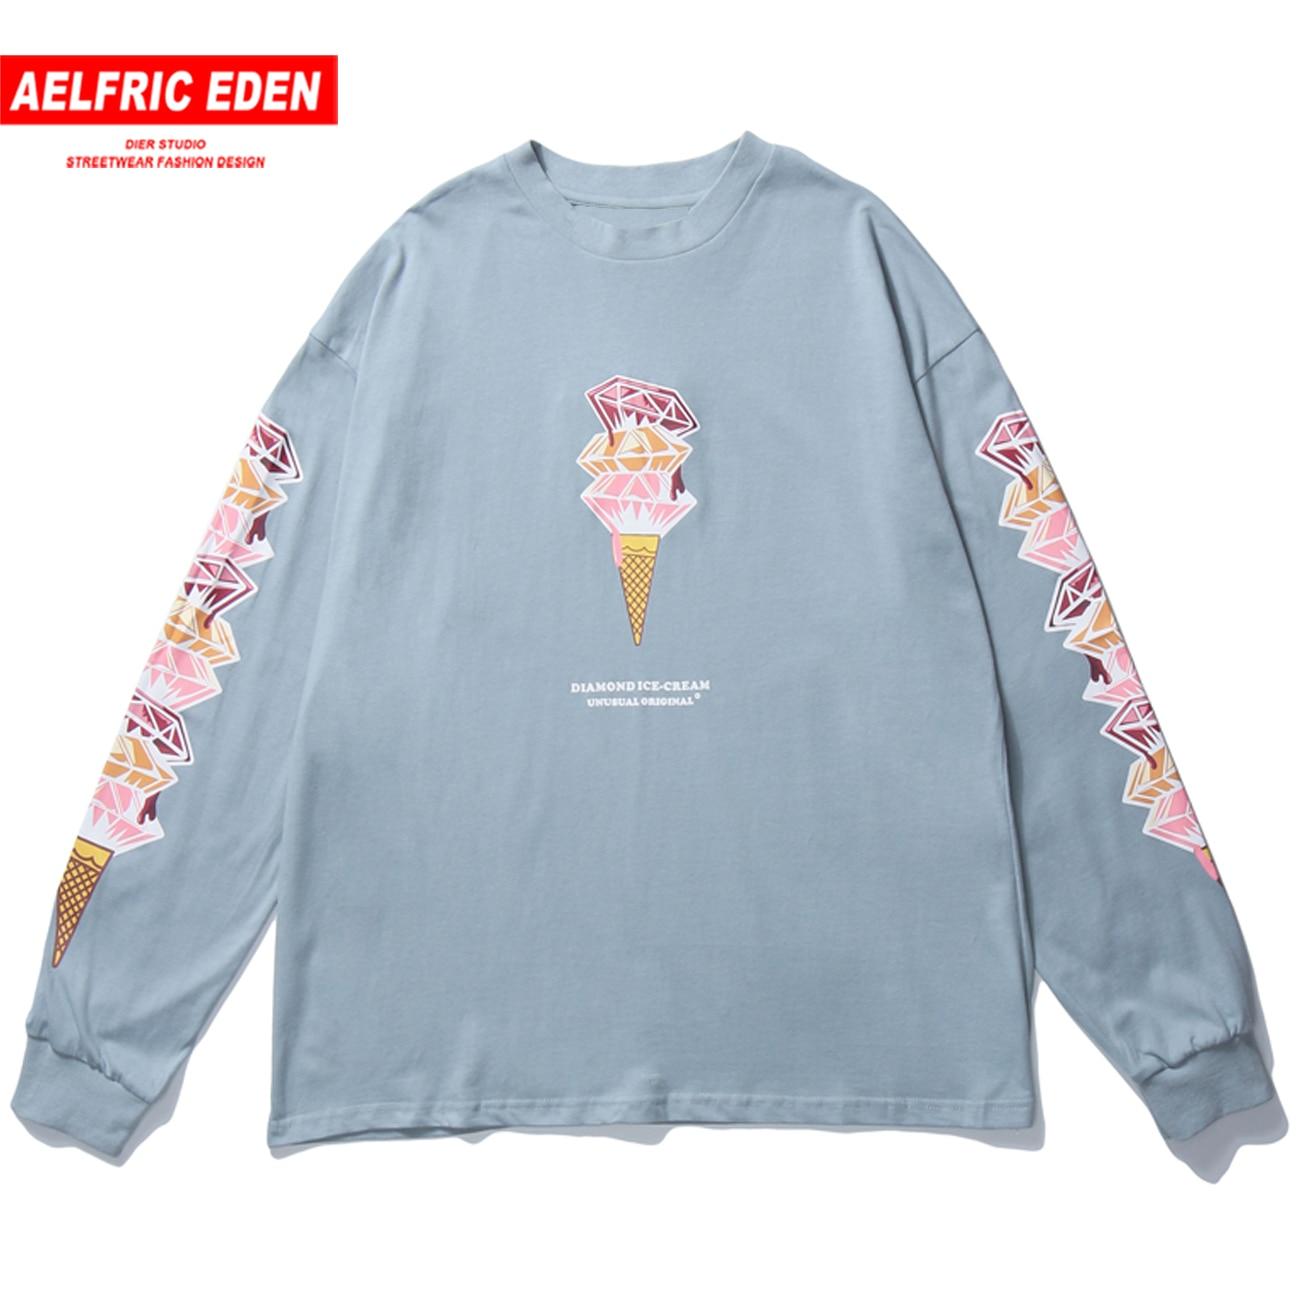 Aelfric Eden 2020 Herfst Ijs Print T-shirt Mannen Hip Hop Losse Tshirt Lange Mouwen Harajuku T-shirt Casual Tees shirts Zwart